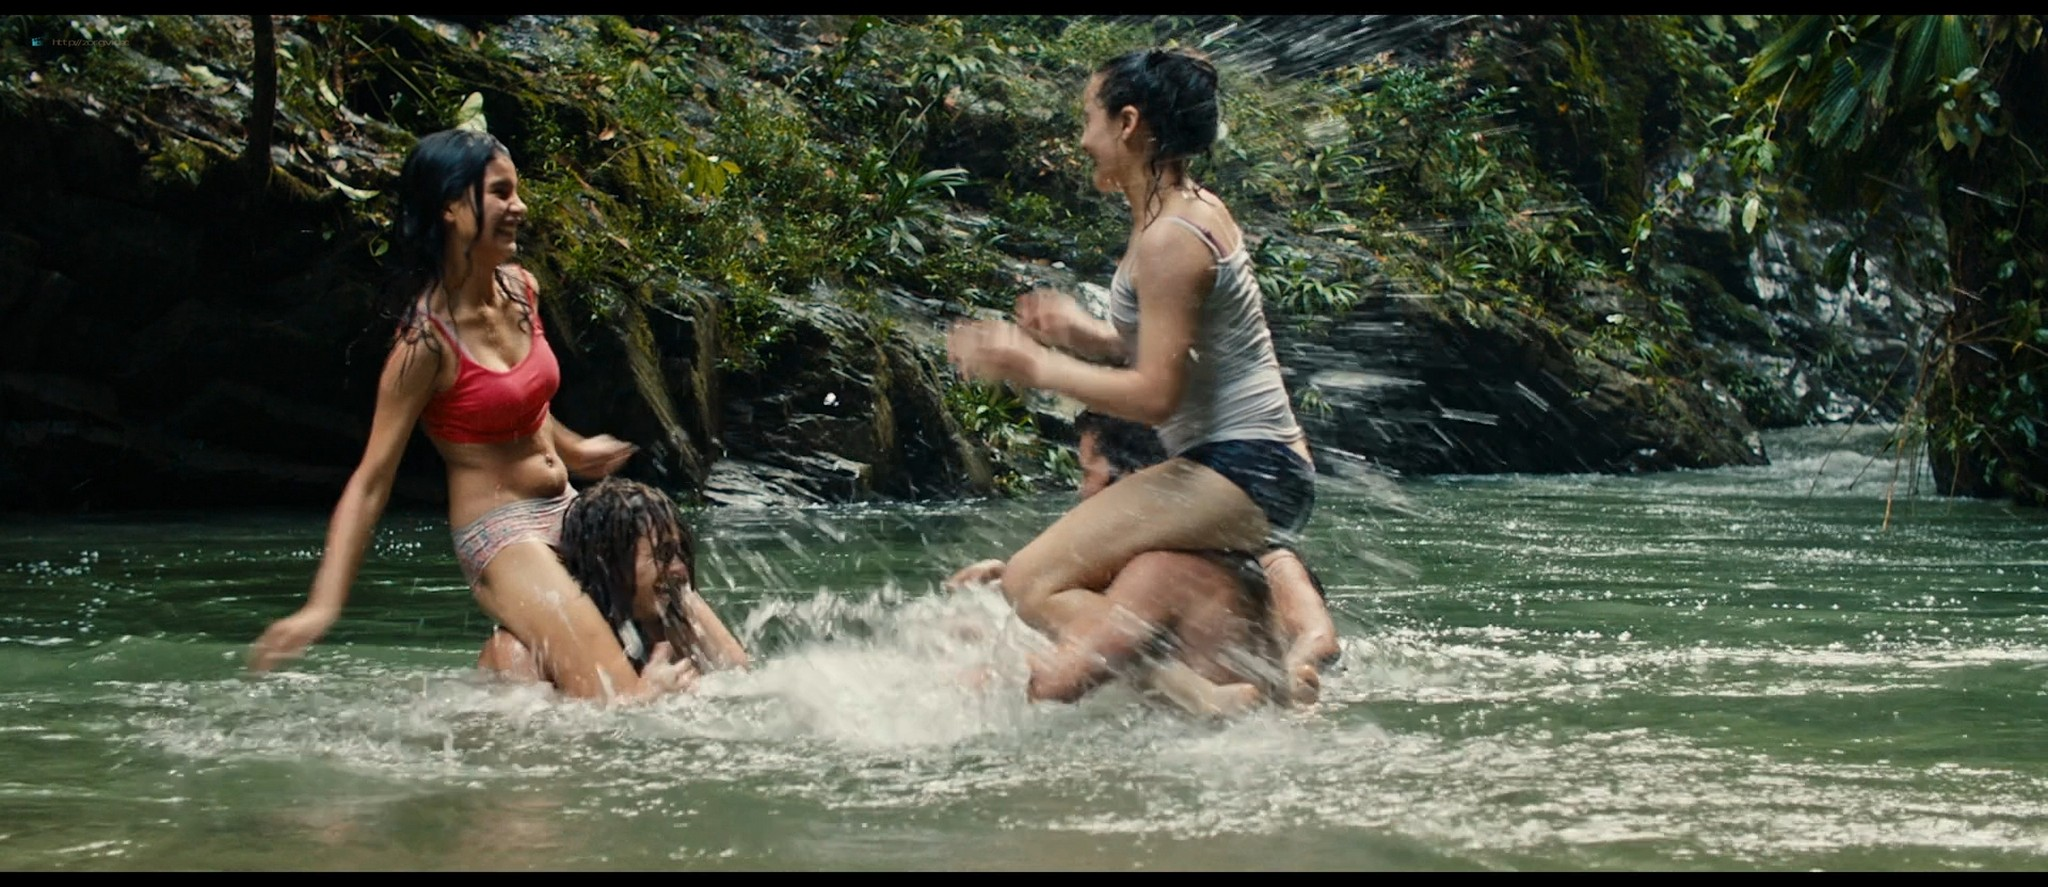 Julianne Nicholson pokies Karen Quintero, Laura Castrillón sexy - Monos (2019) HD 1080p BluRay (11)